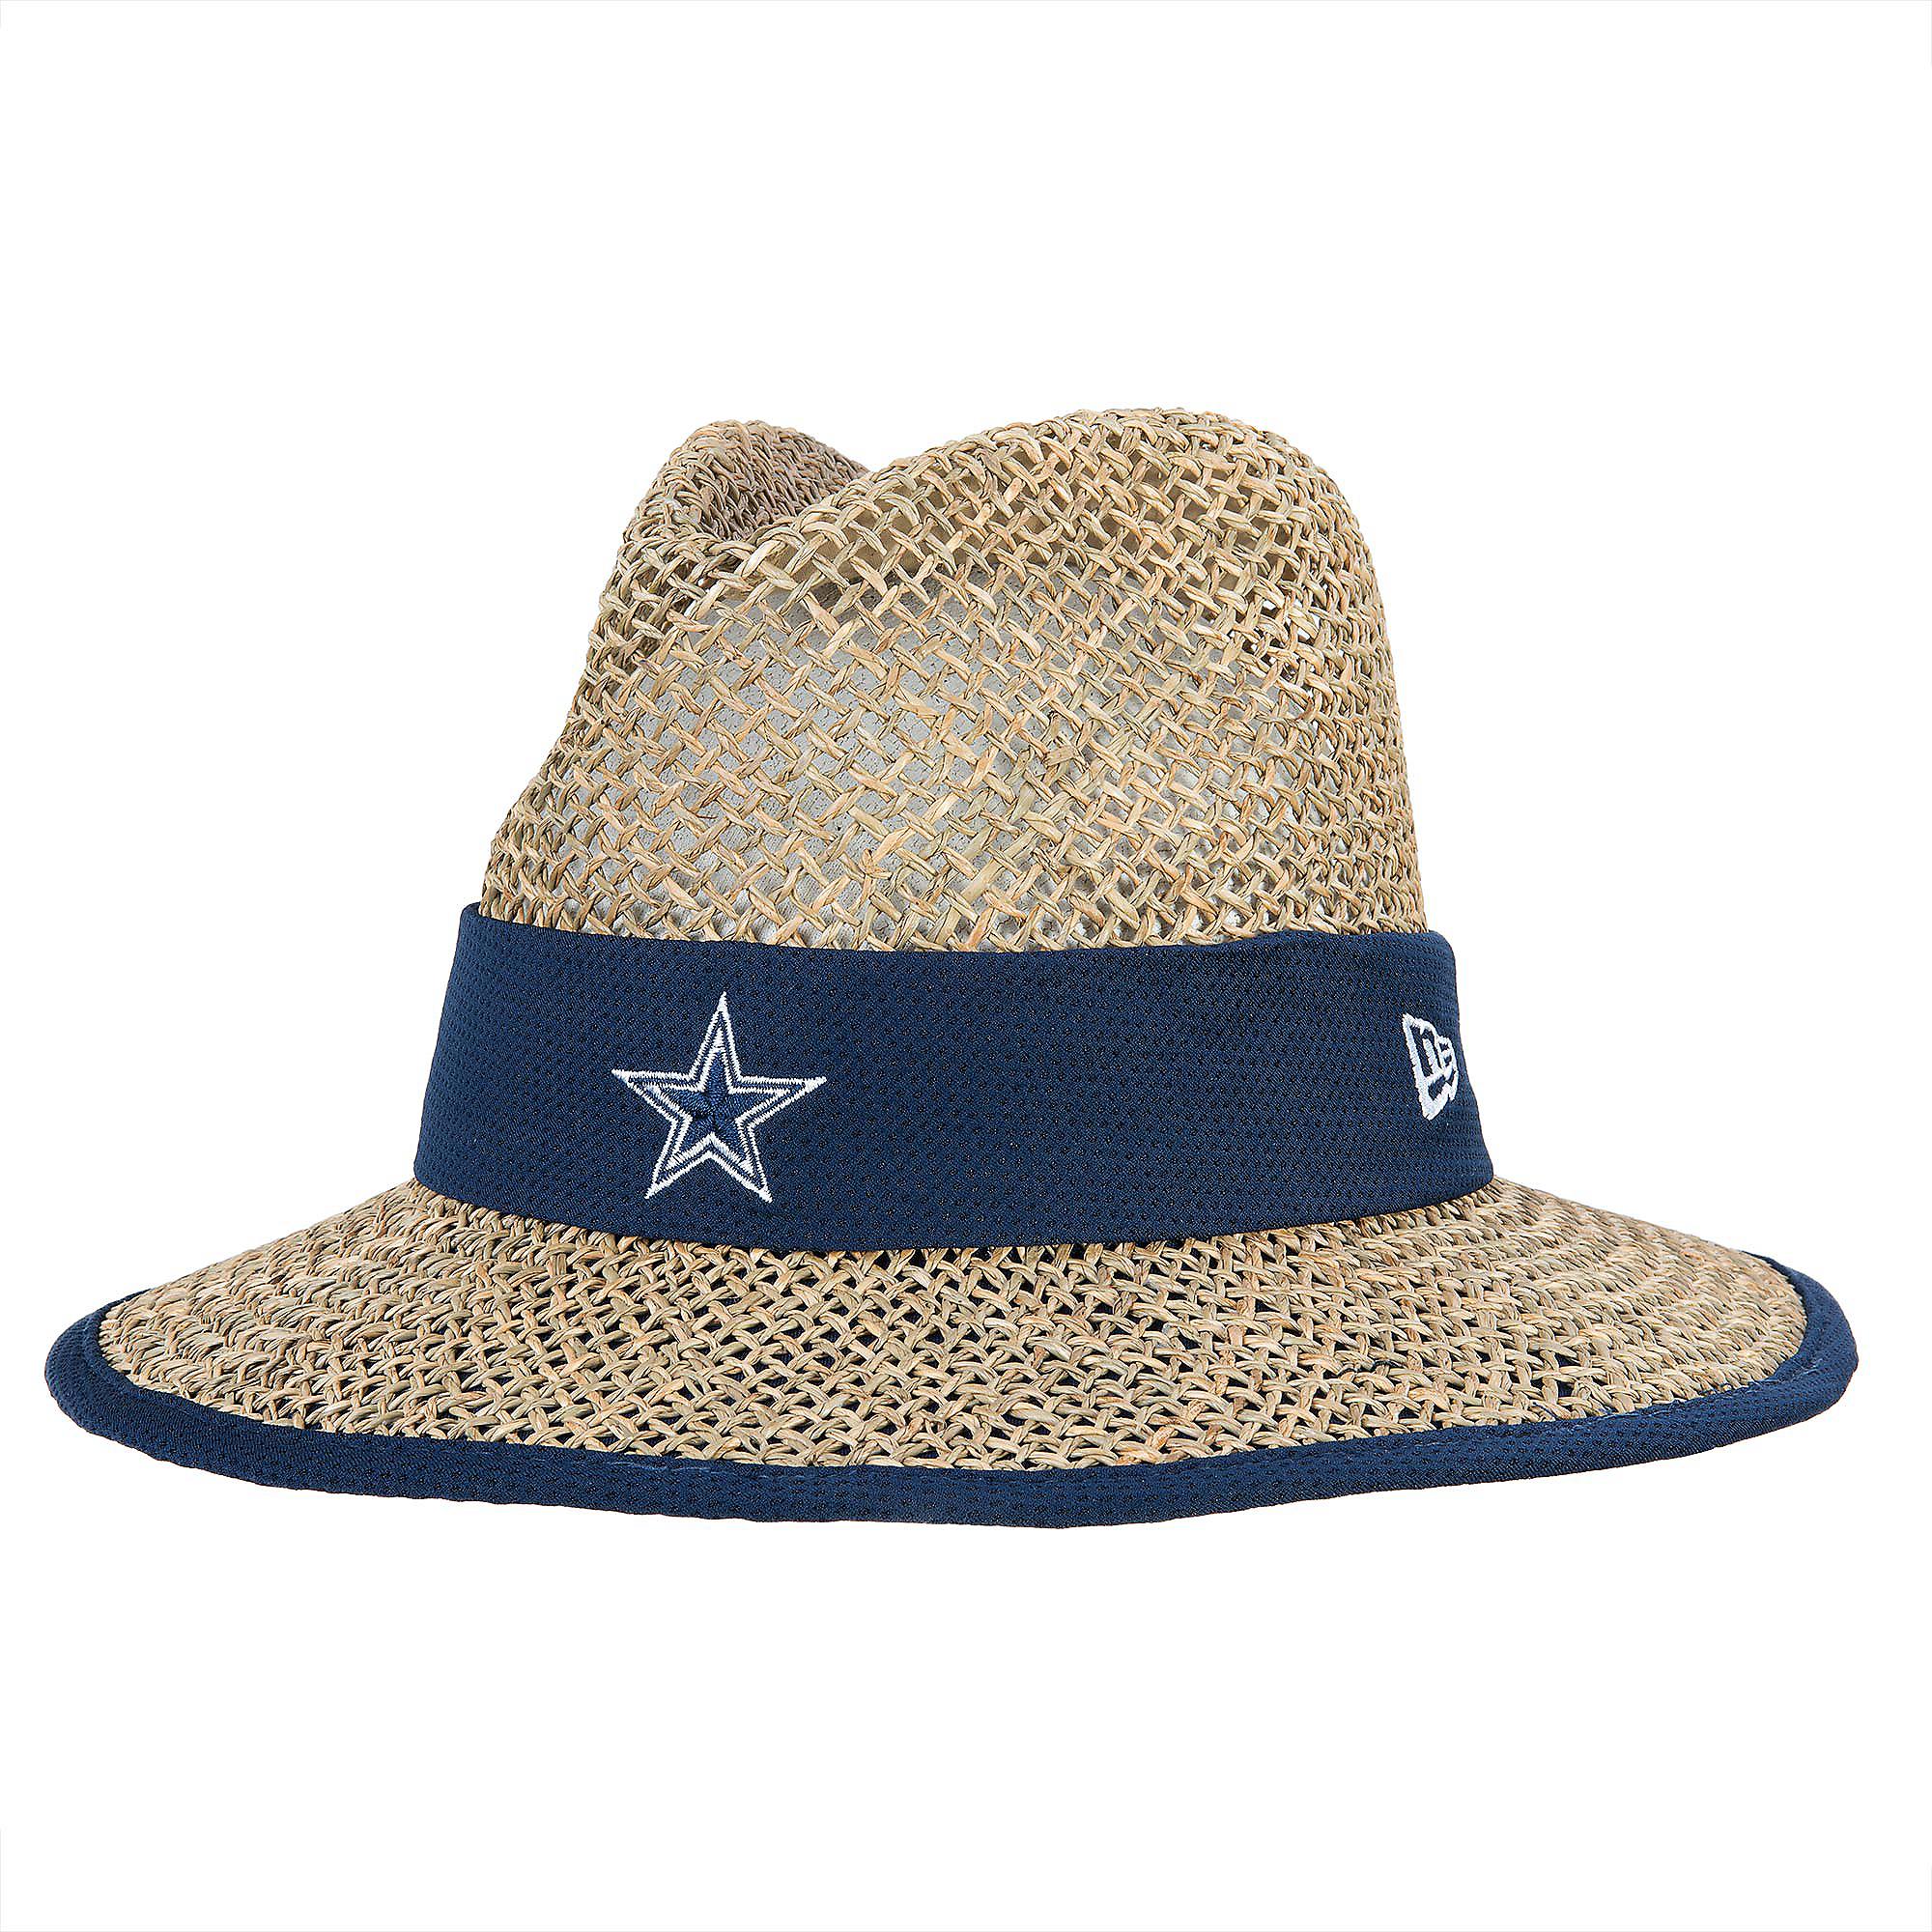 30d99080dfcb90 Dallas Cowboys New Era Training Straw Hat | Dallas Cowboys Pro Shop